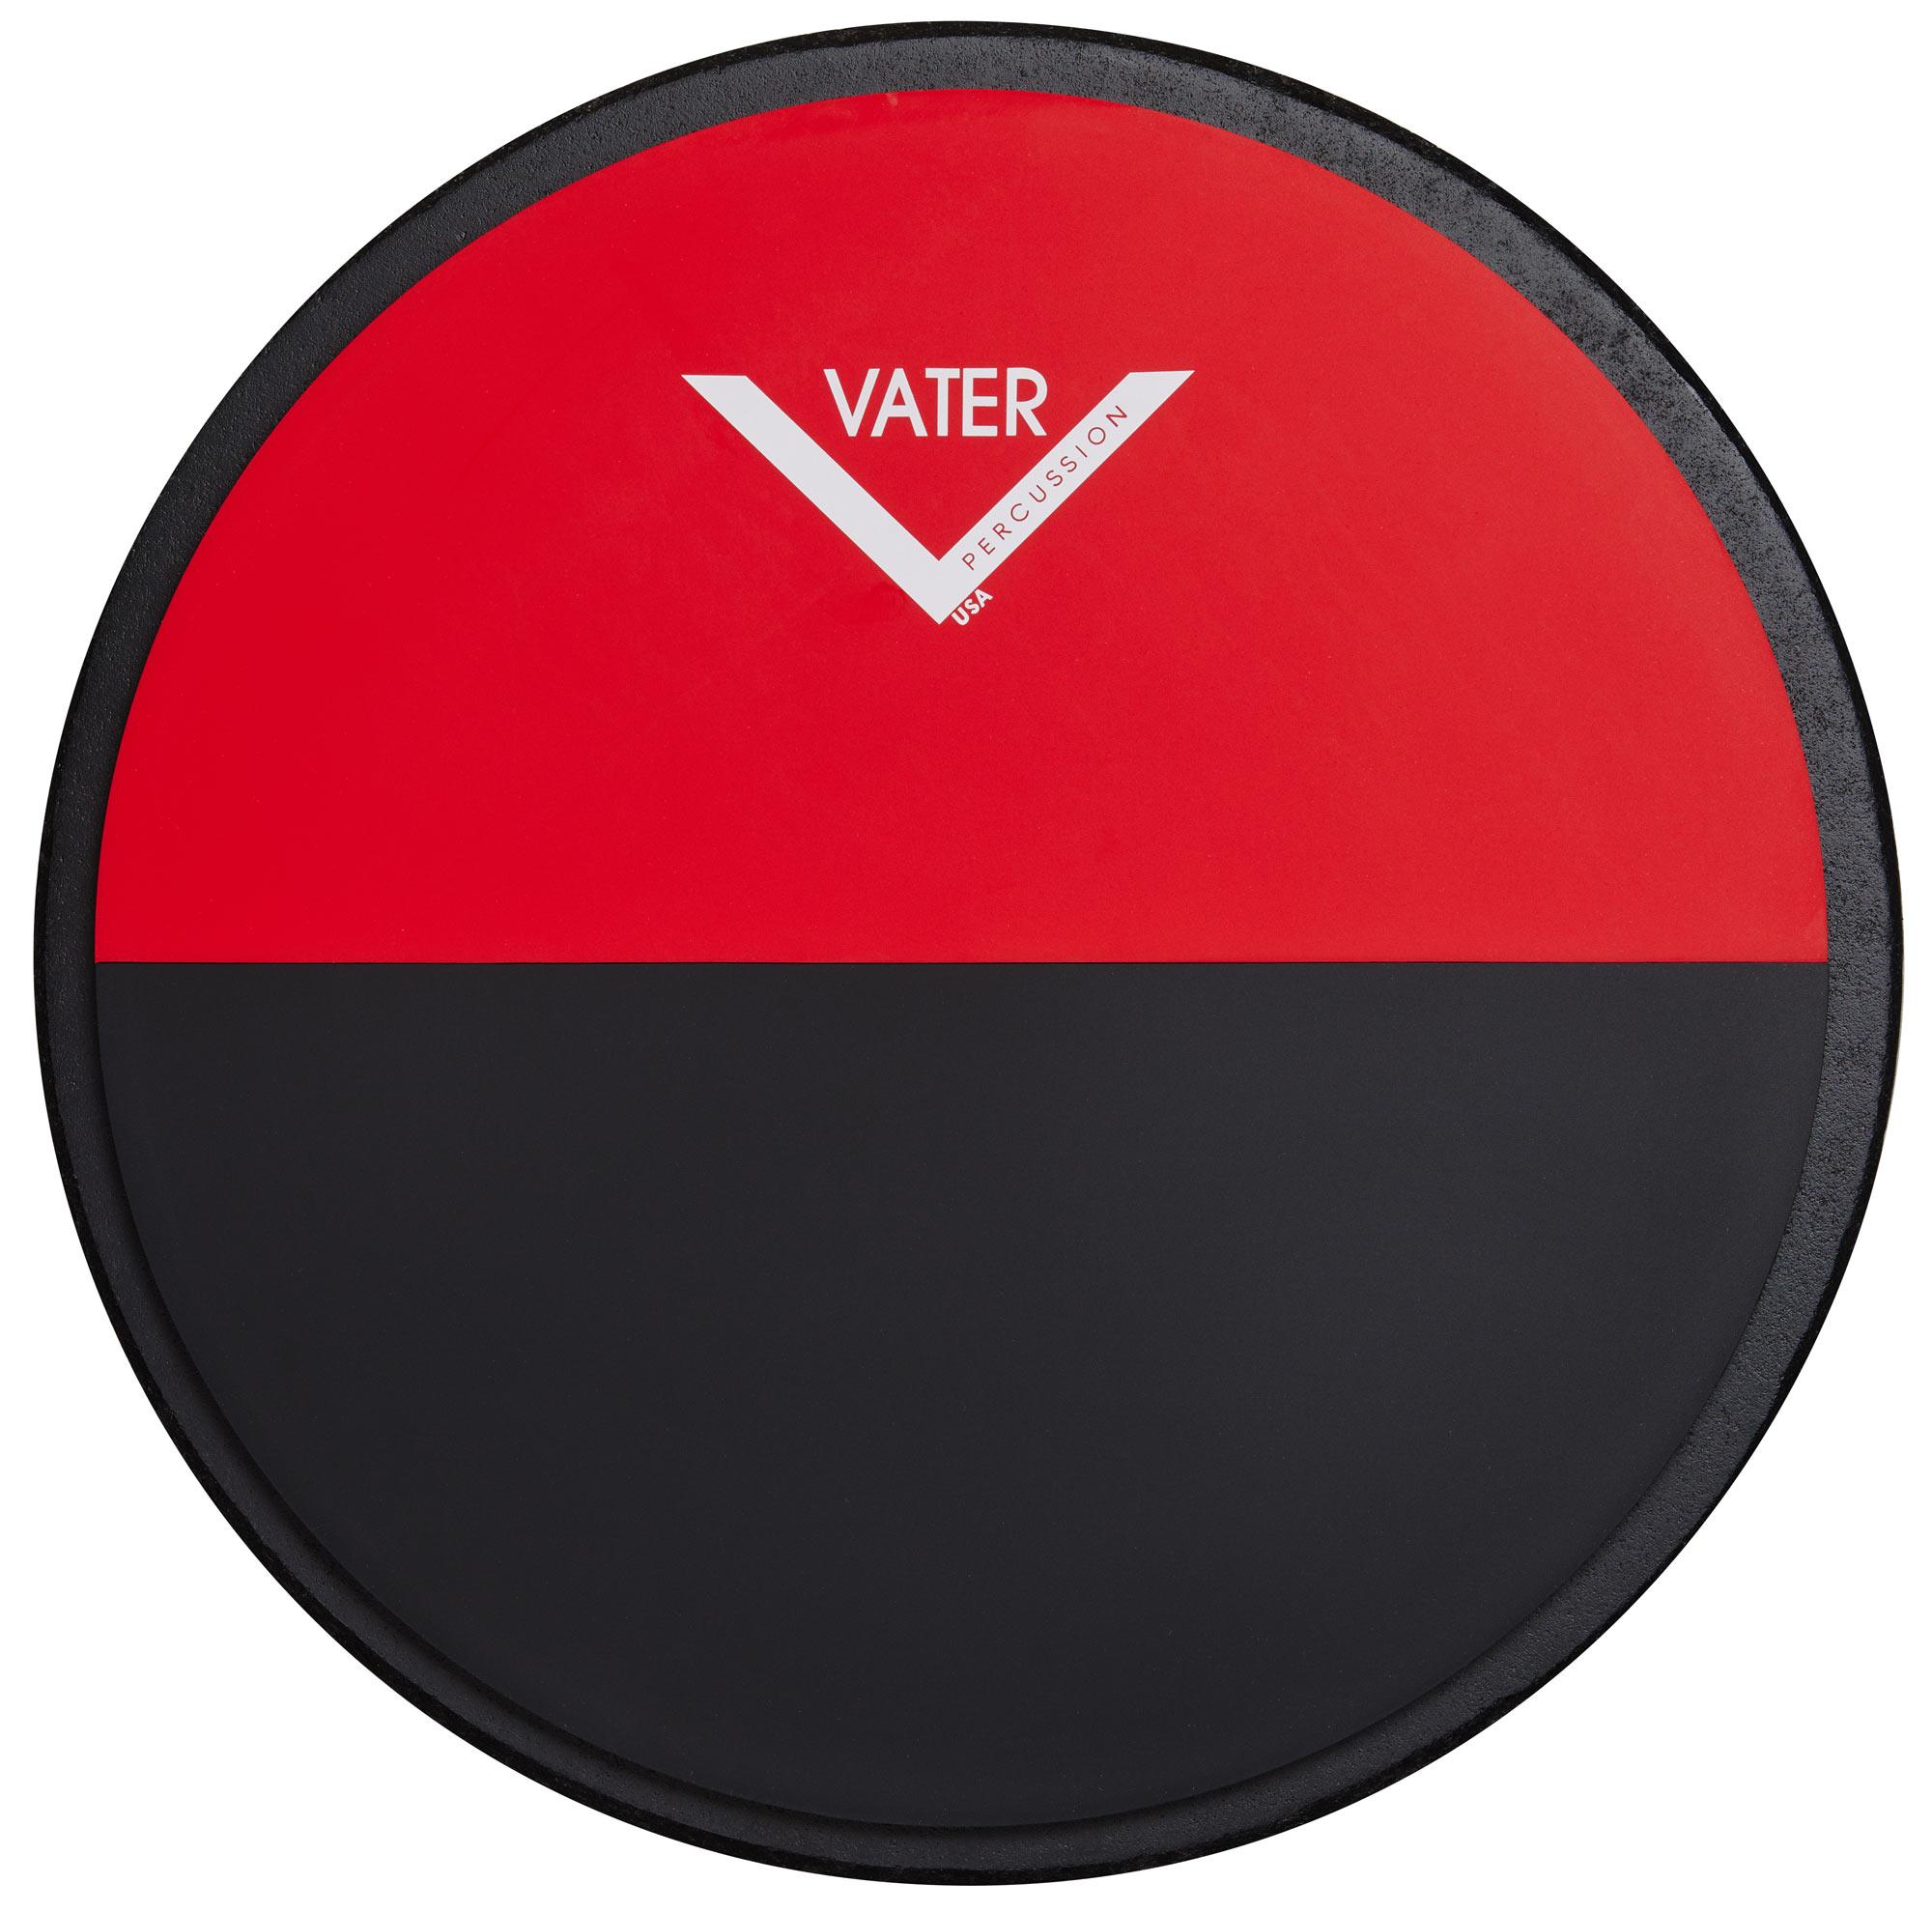 vater percussion chop builder 12 single split surface practice pad. Black Bedroom Furniture Sets. Home Design Ideas